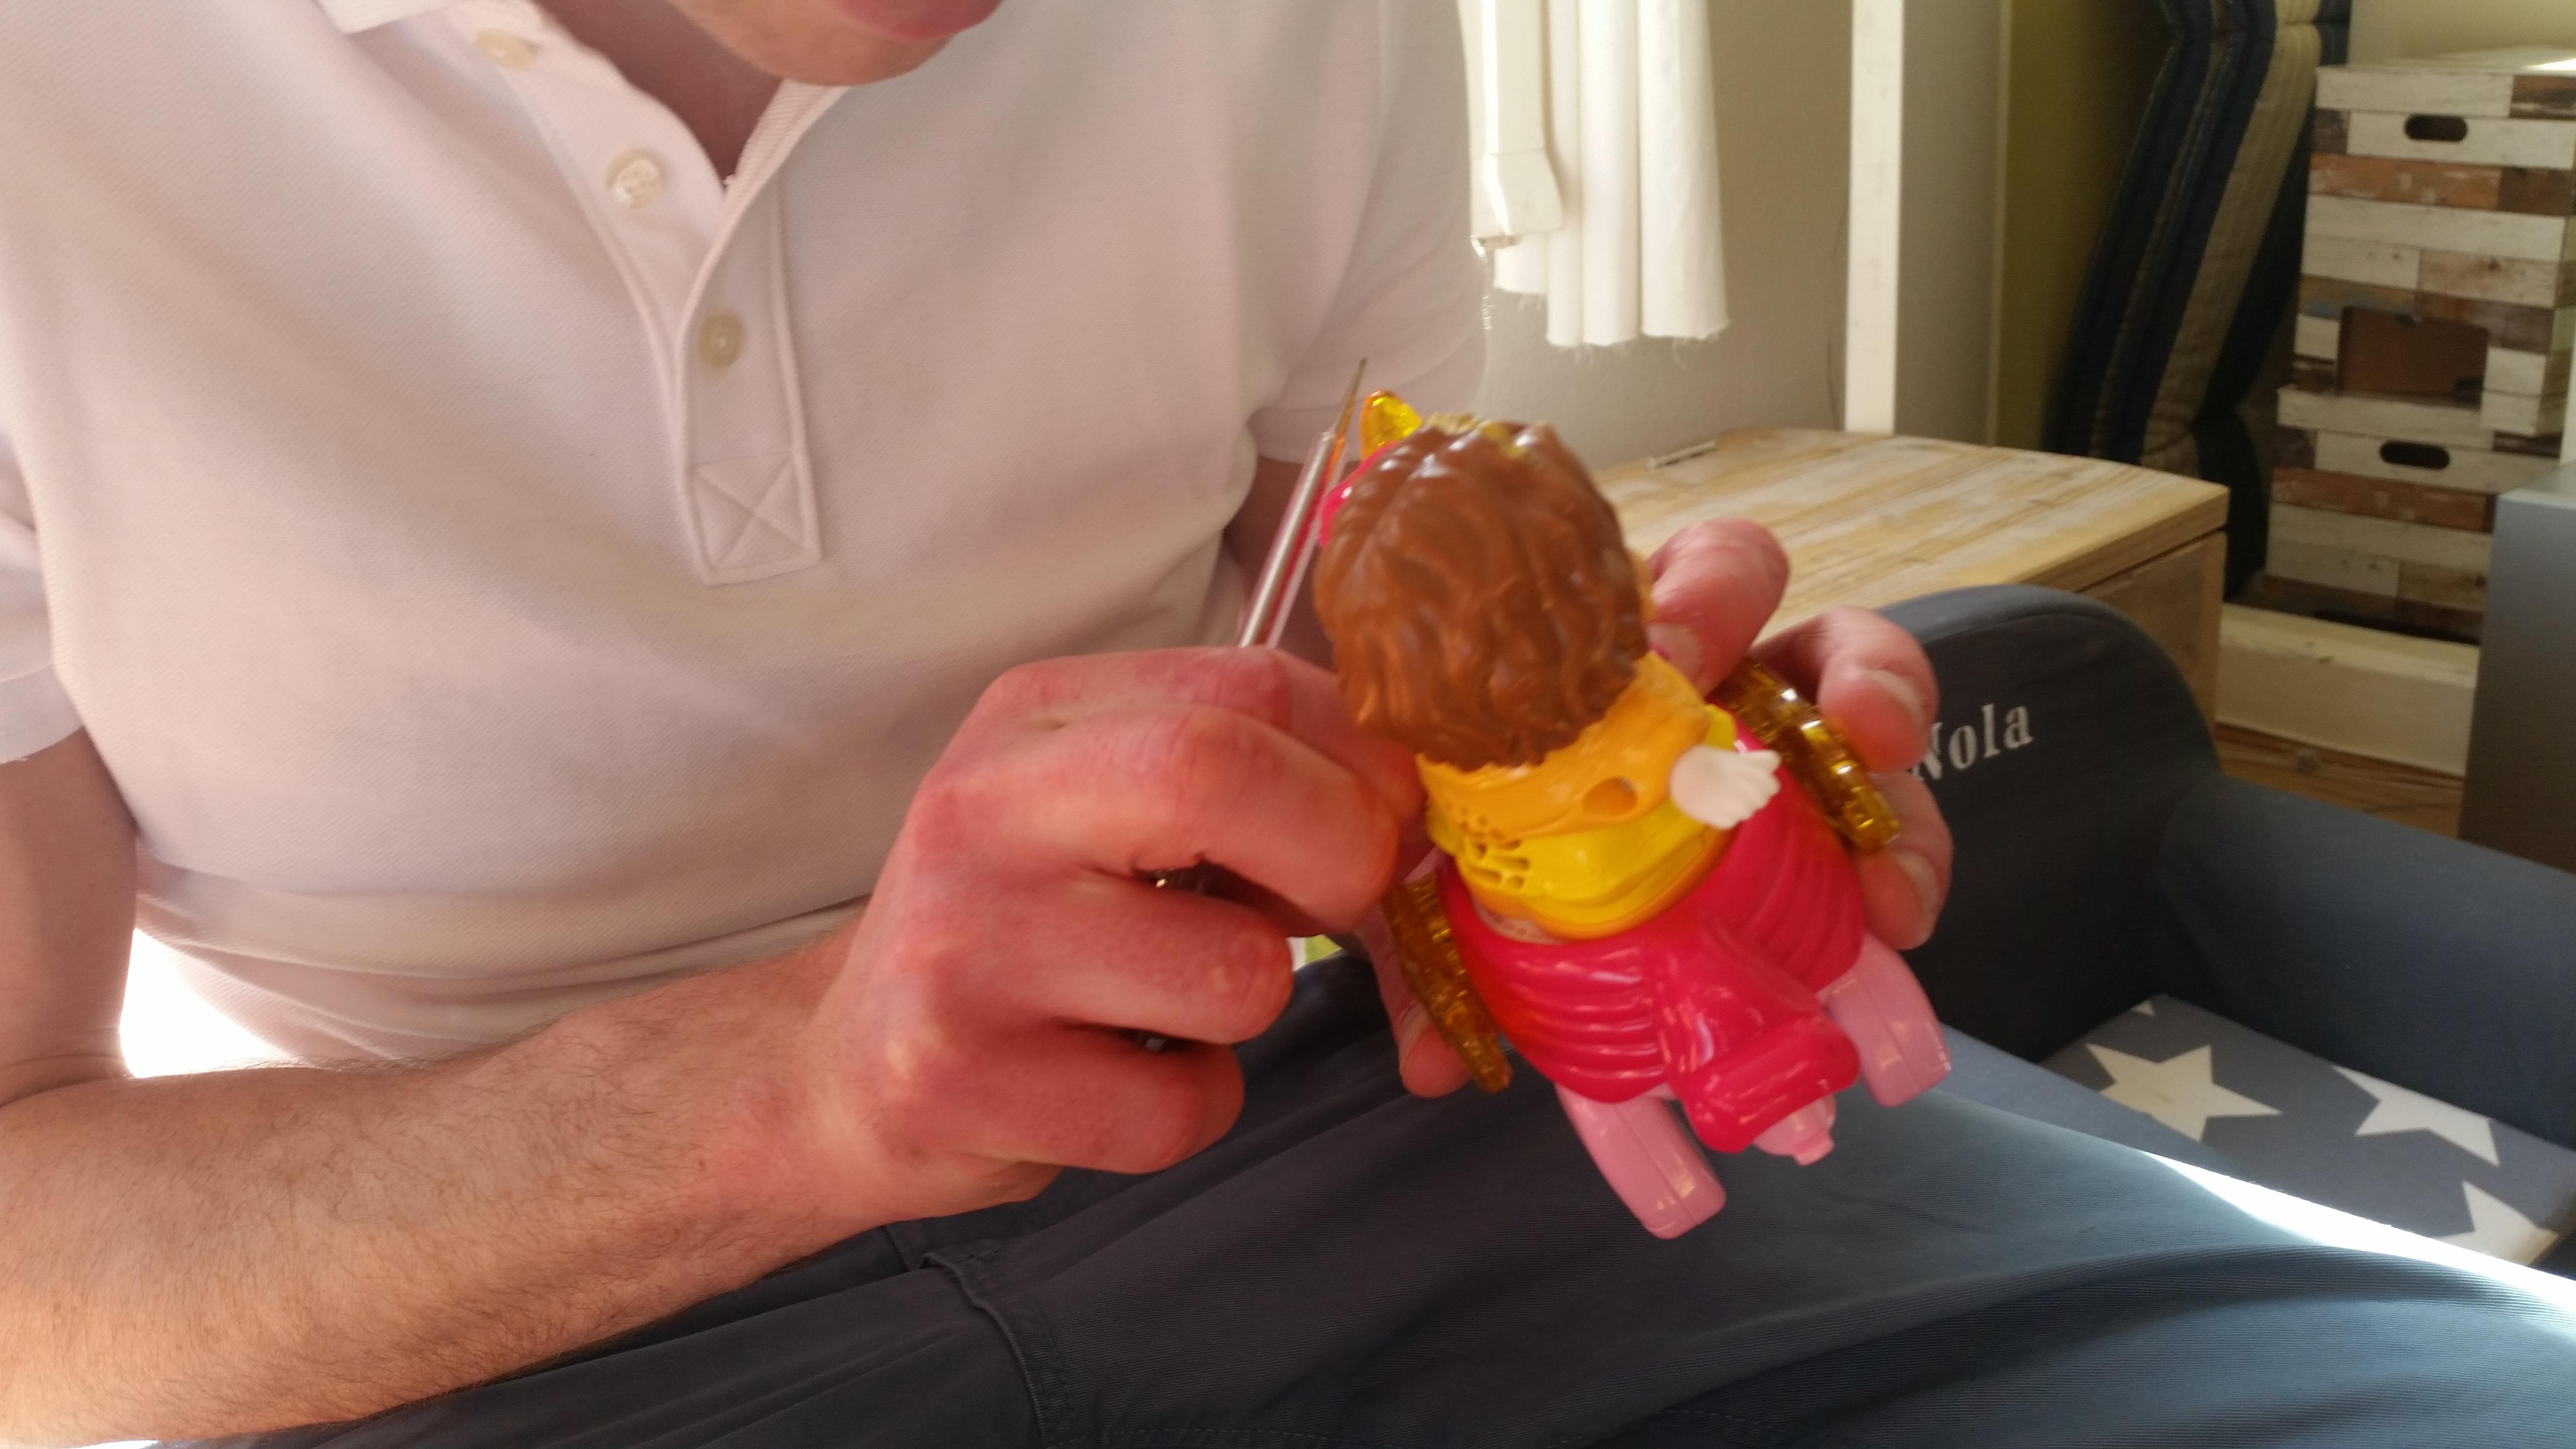 5-15-prinses-penny-eenhoorn-vtech-vrolijke-vriendjes-film-cadeau-verrassing-sint-kerst-liedjes-magische-wereld-mama-nanny-amsterdam-man-mooi